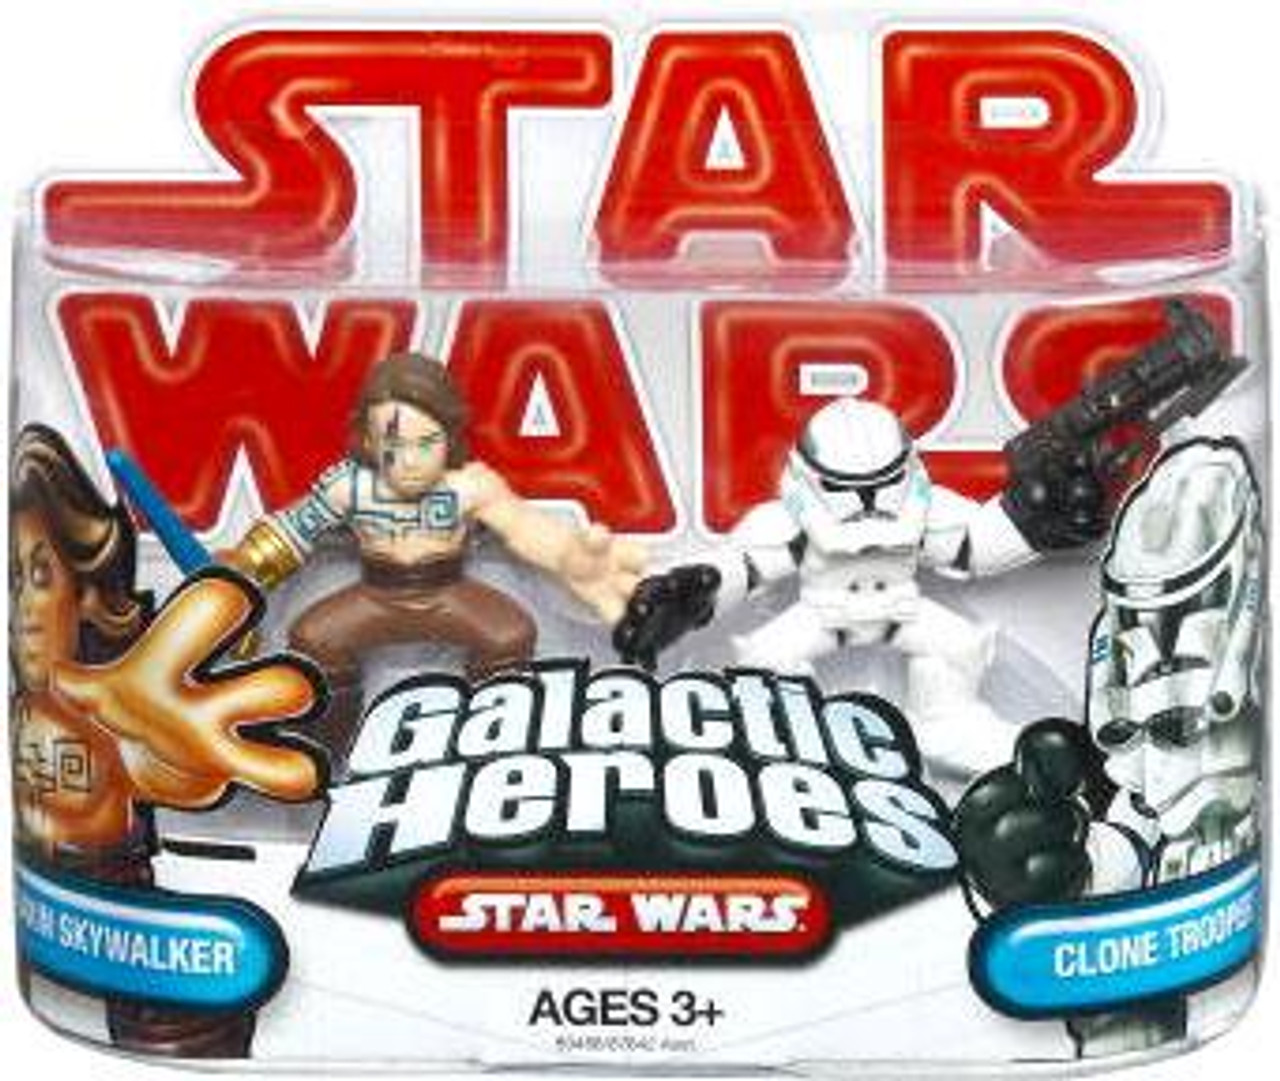 Star Wars The Clone Wars Galactic Heroes 2009 Anakin Skywalker [Tattoos] & Clone Trooper Mini Figure 2-Pack